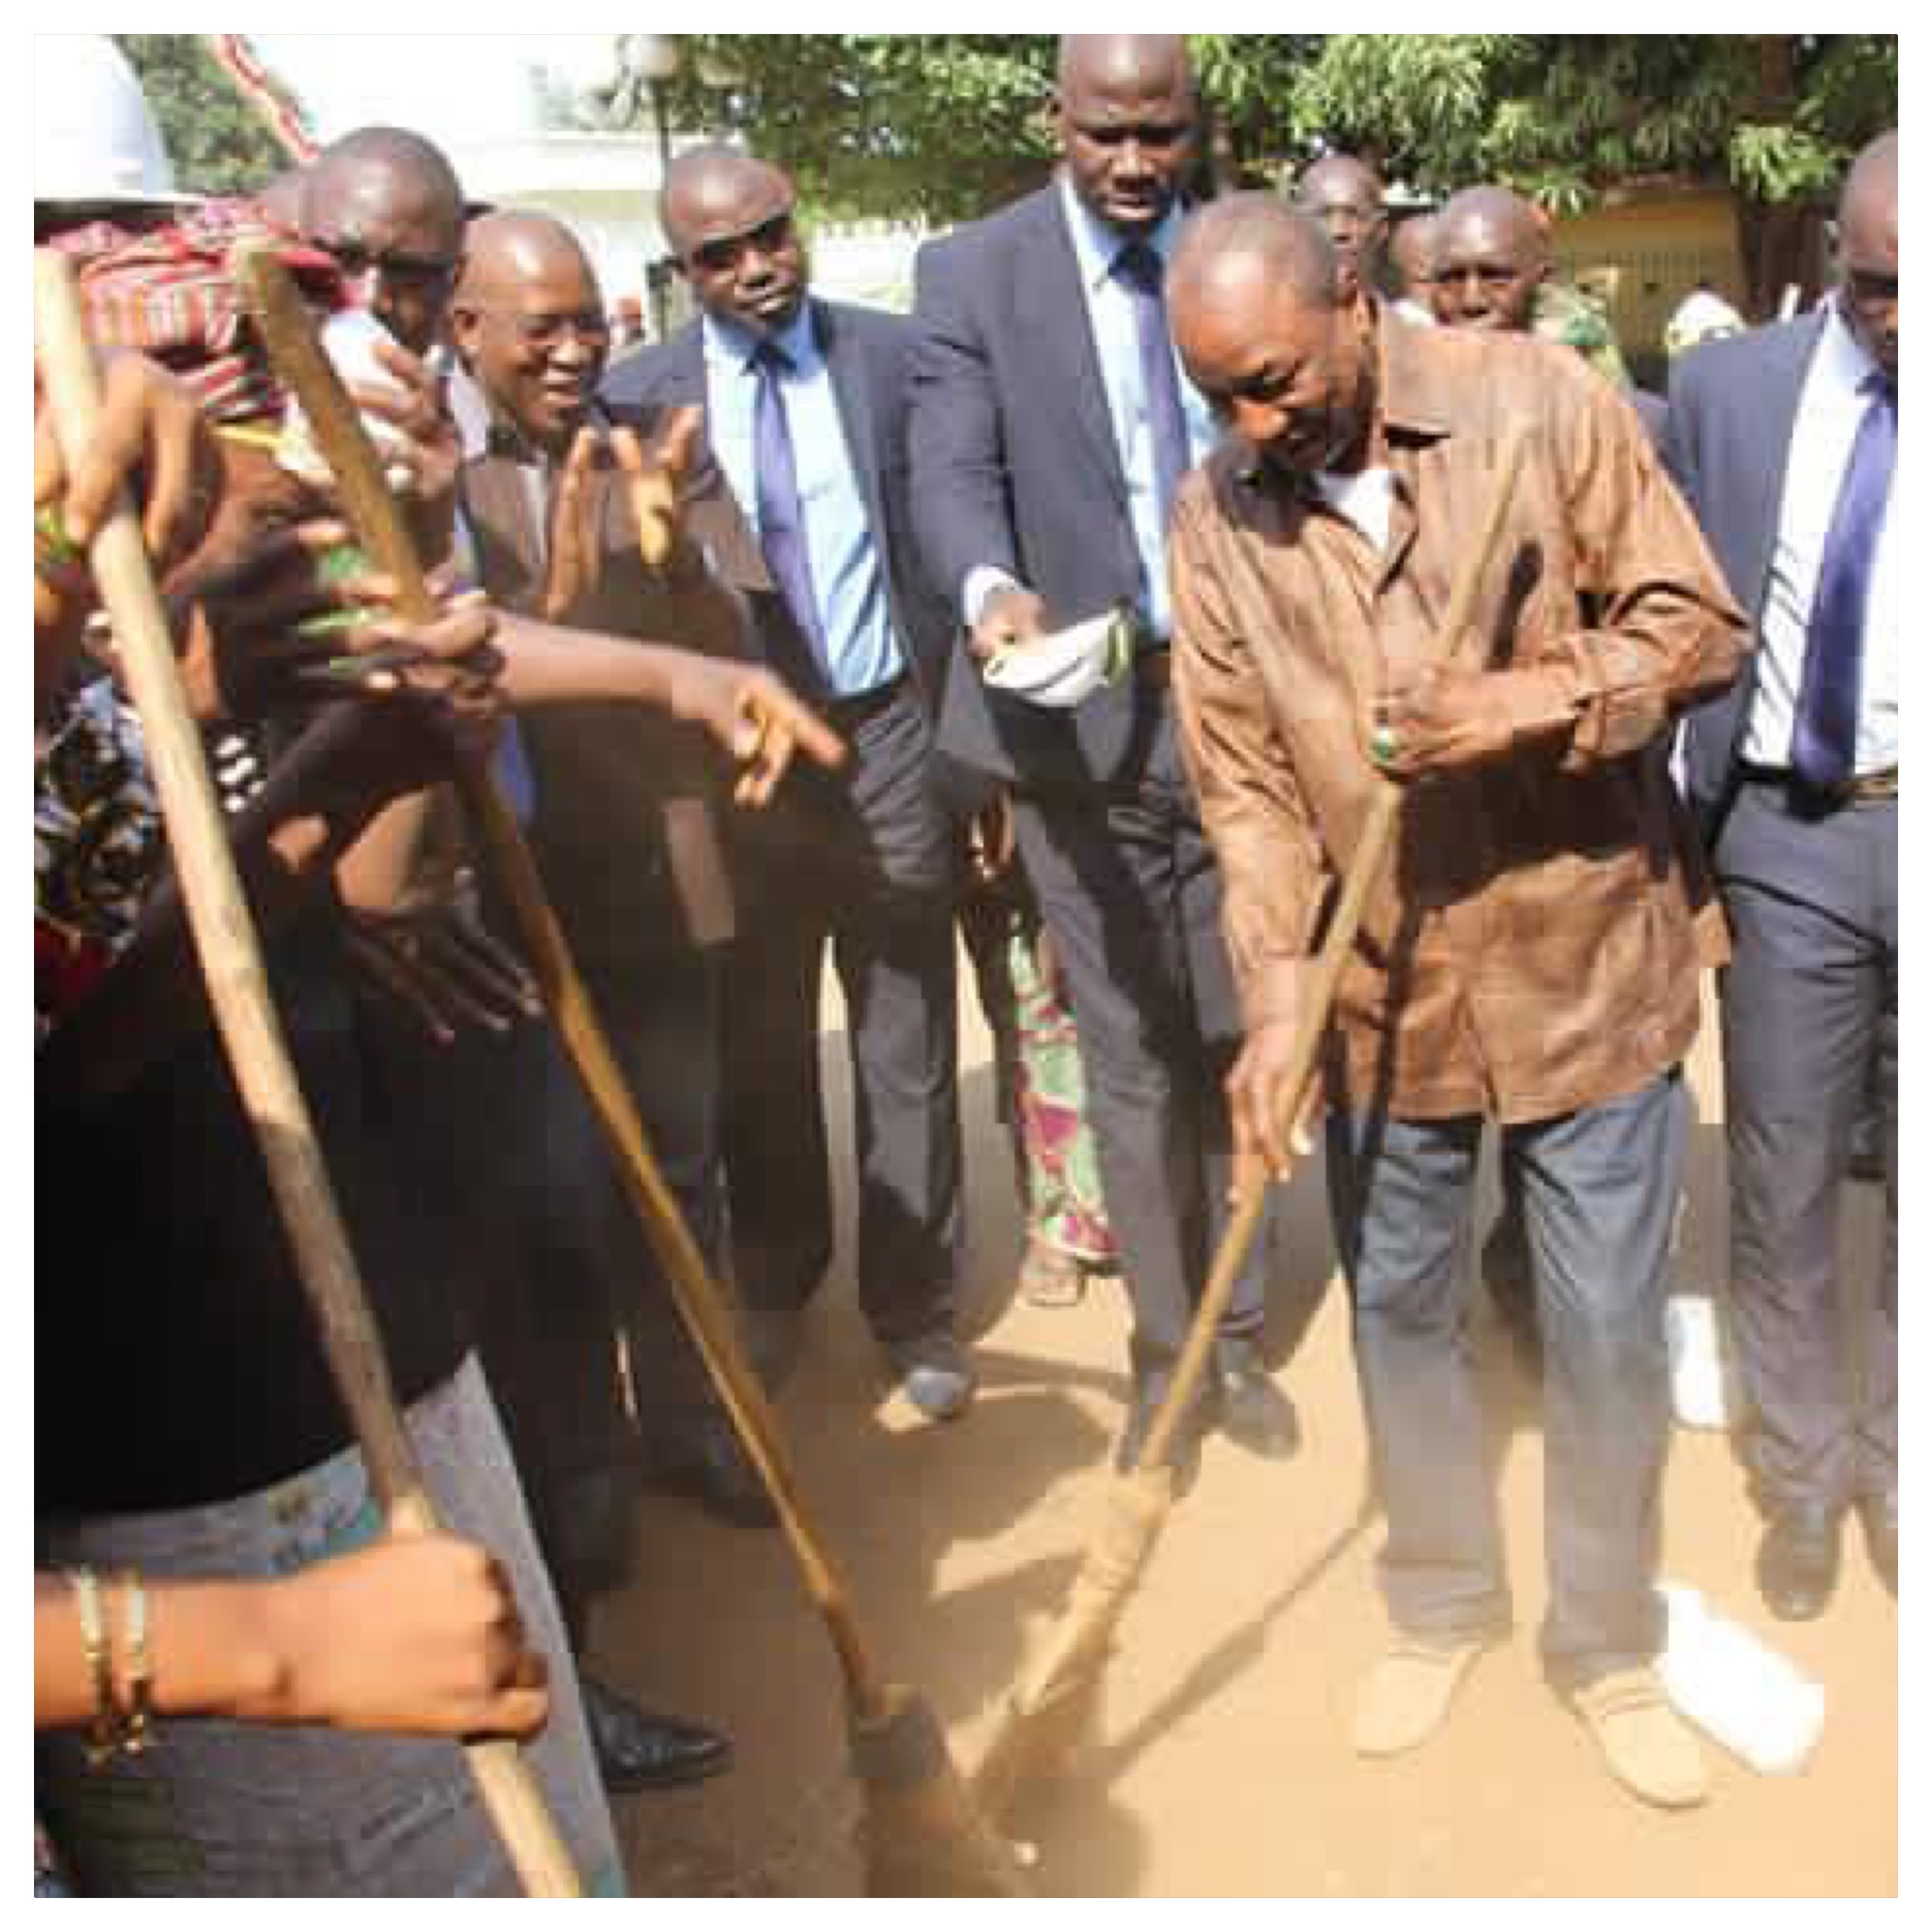 Alpha Conde President Guineen balai la capitale conakry